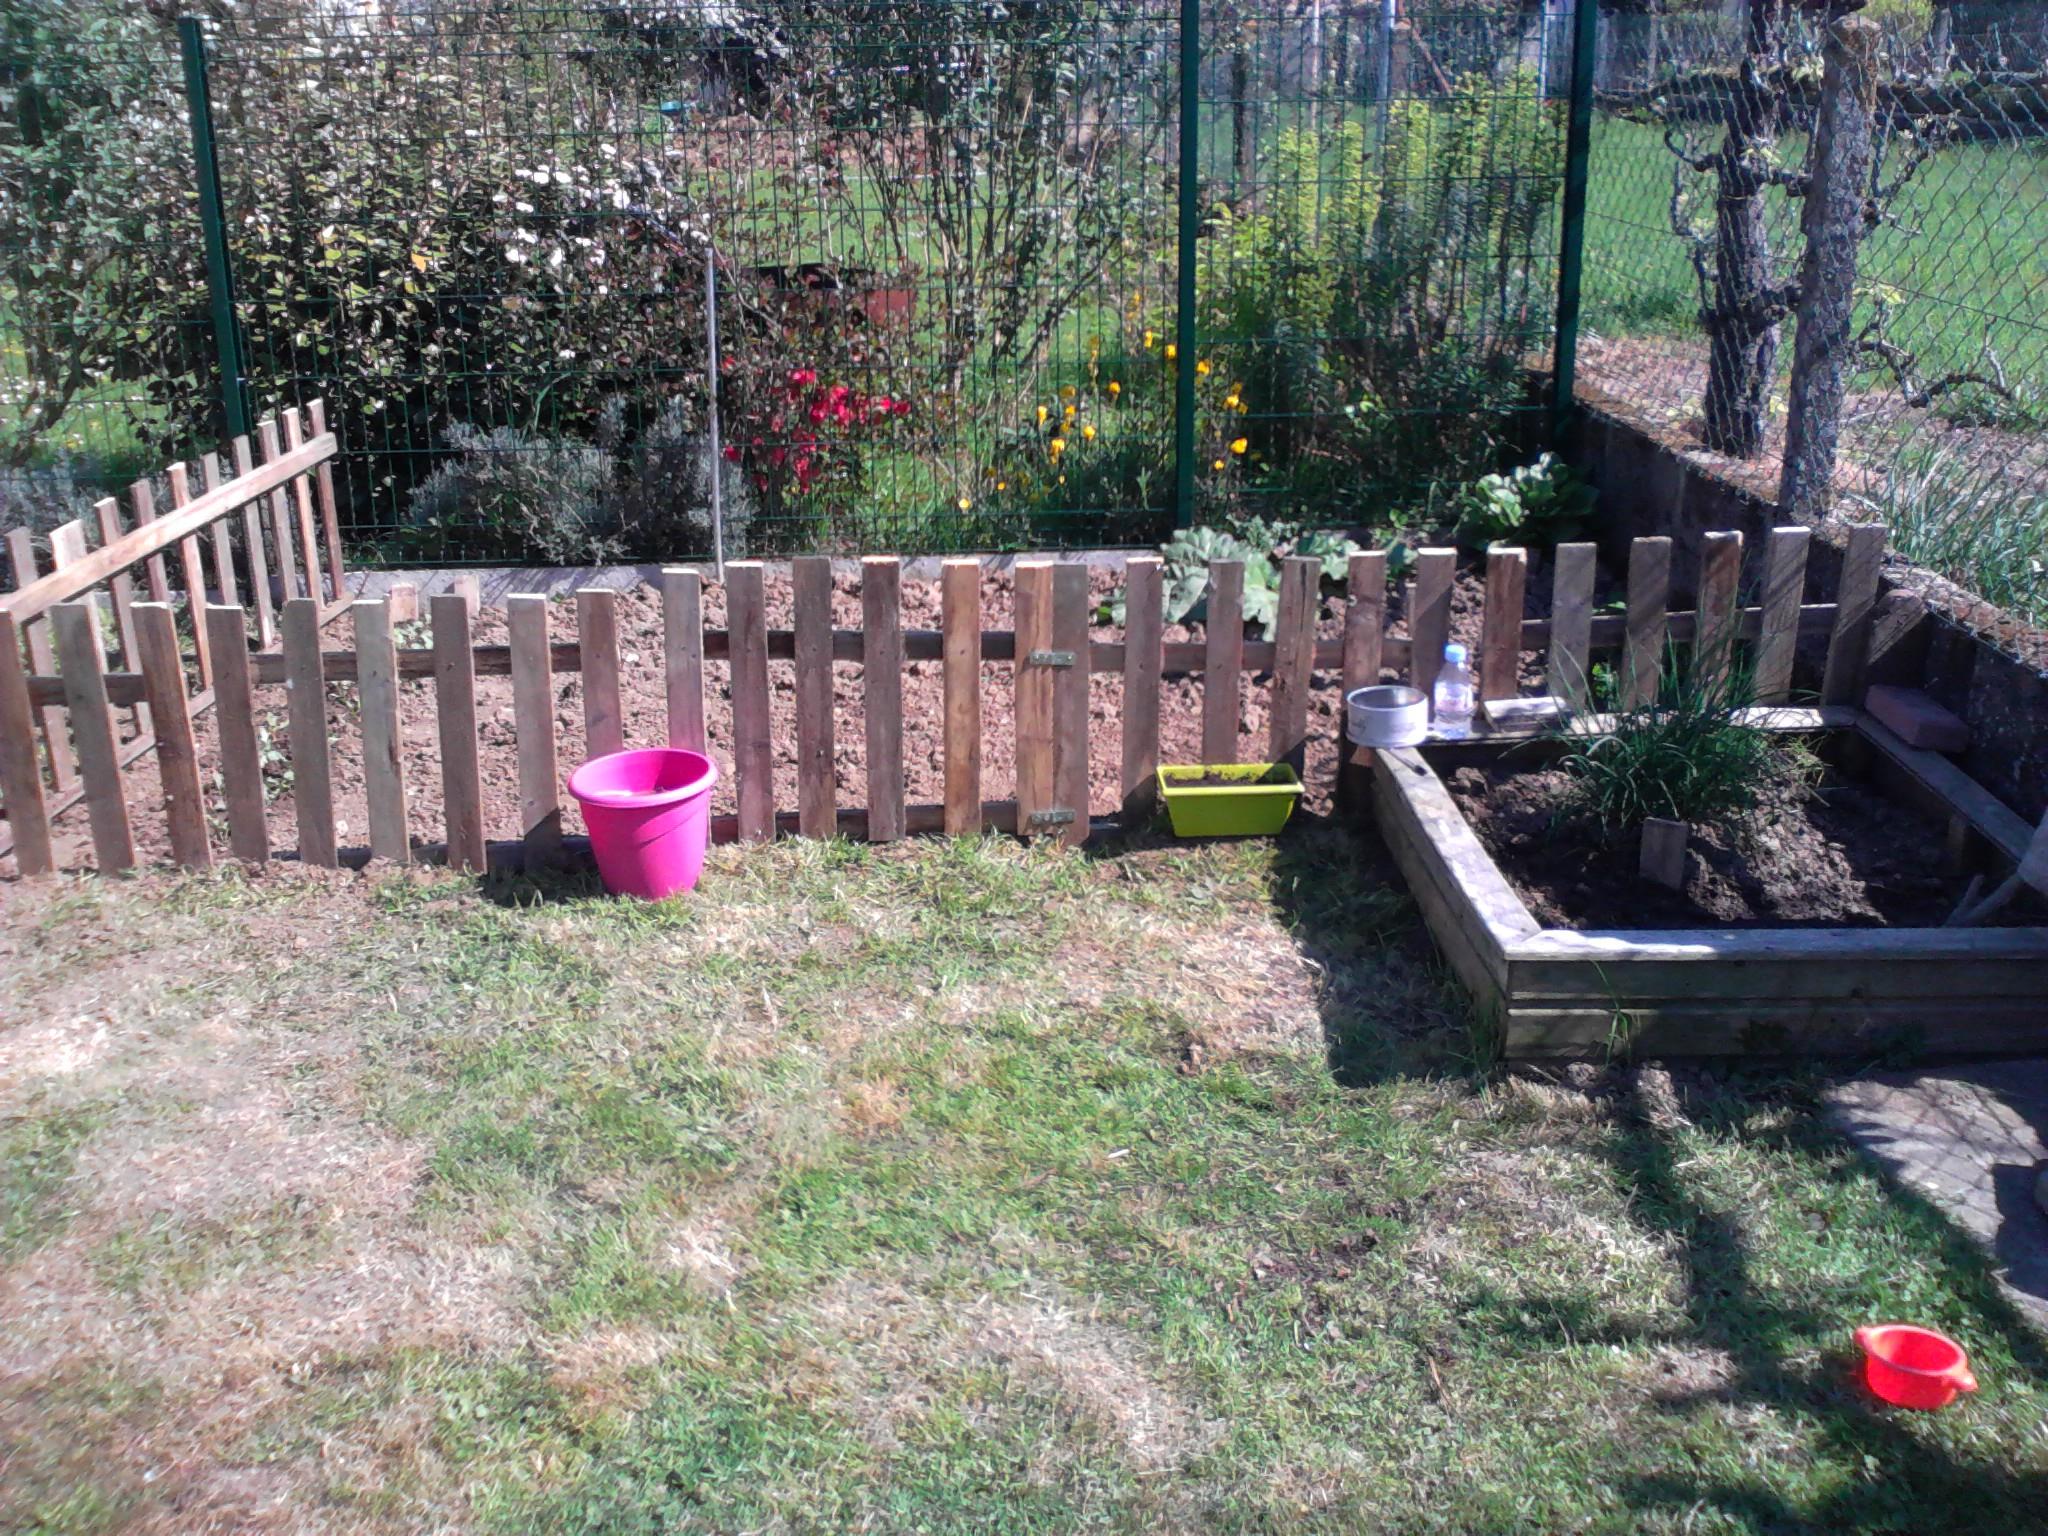 ☆ Un Petit Potager Au Fond Du Jardin♥ - Un Peu De Tout .... concernant Petite Barriere Jardin